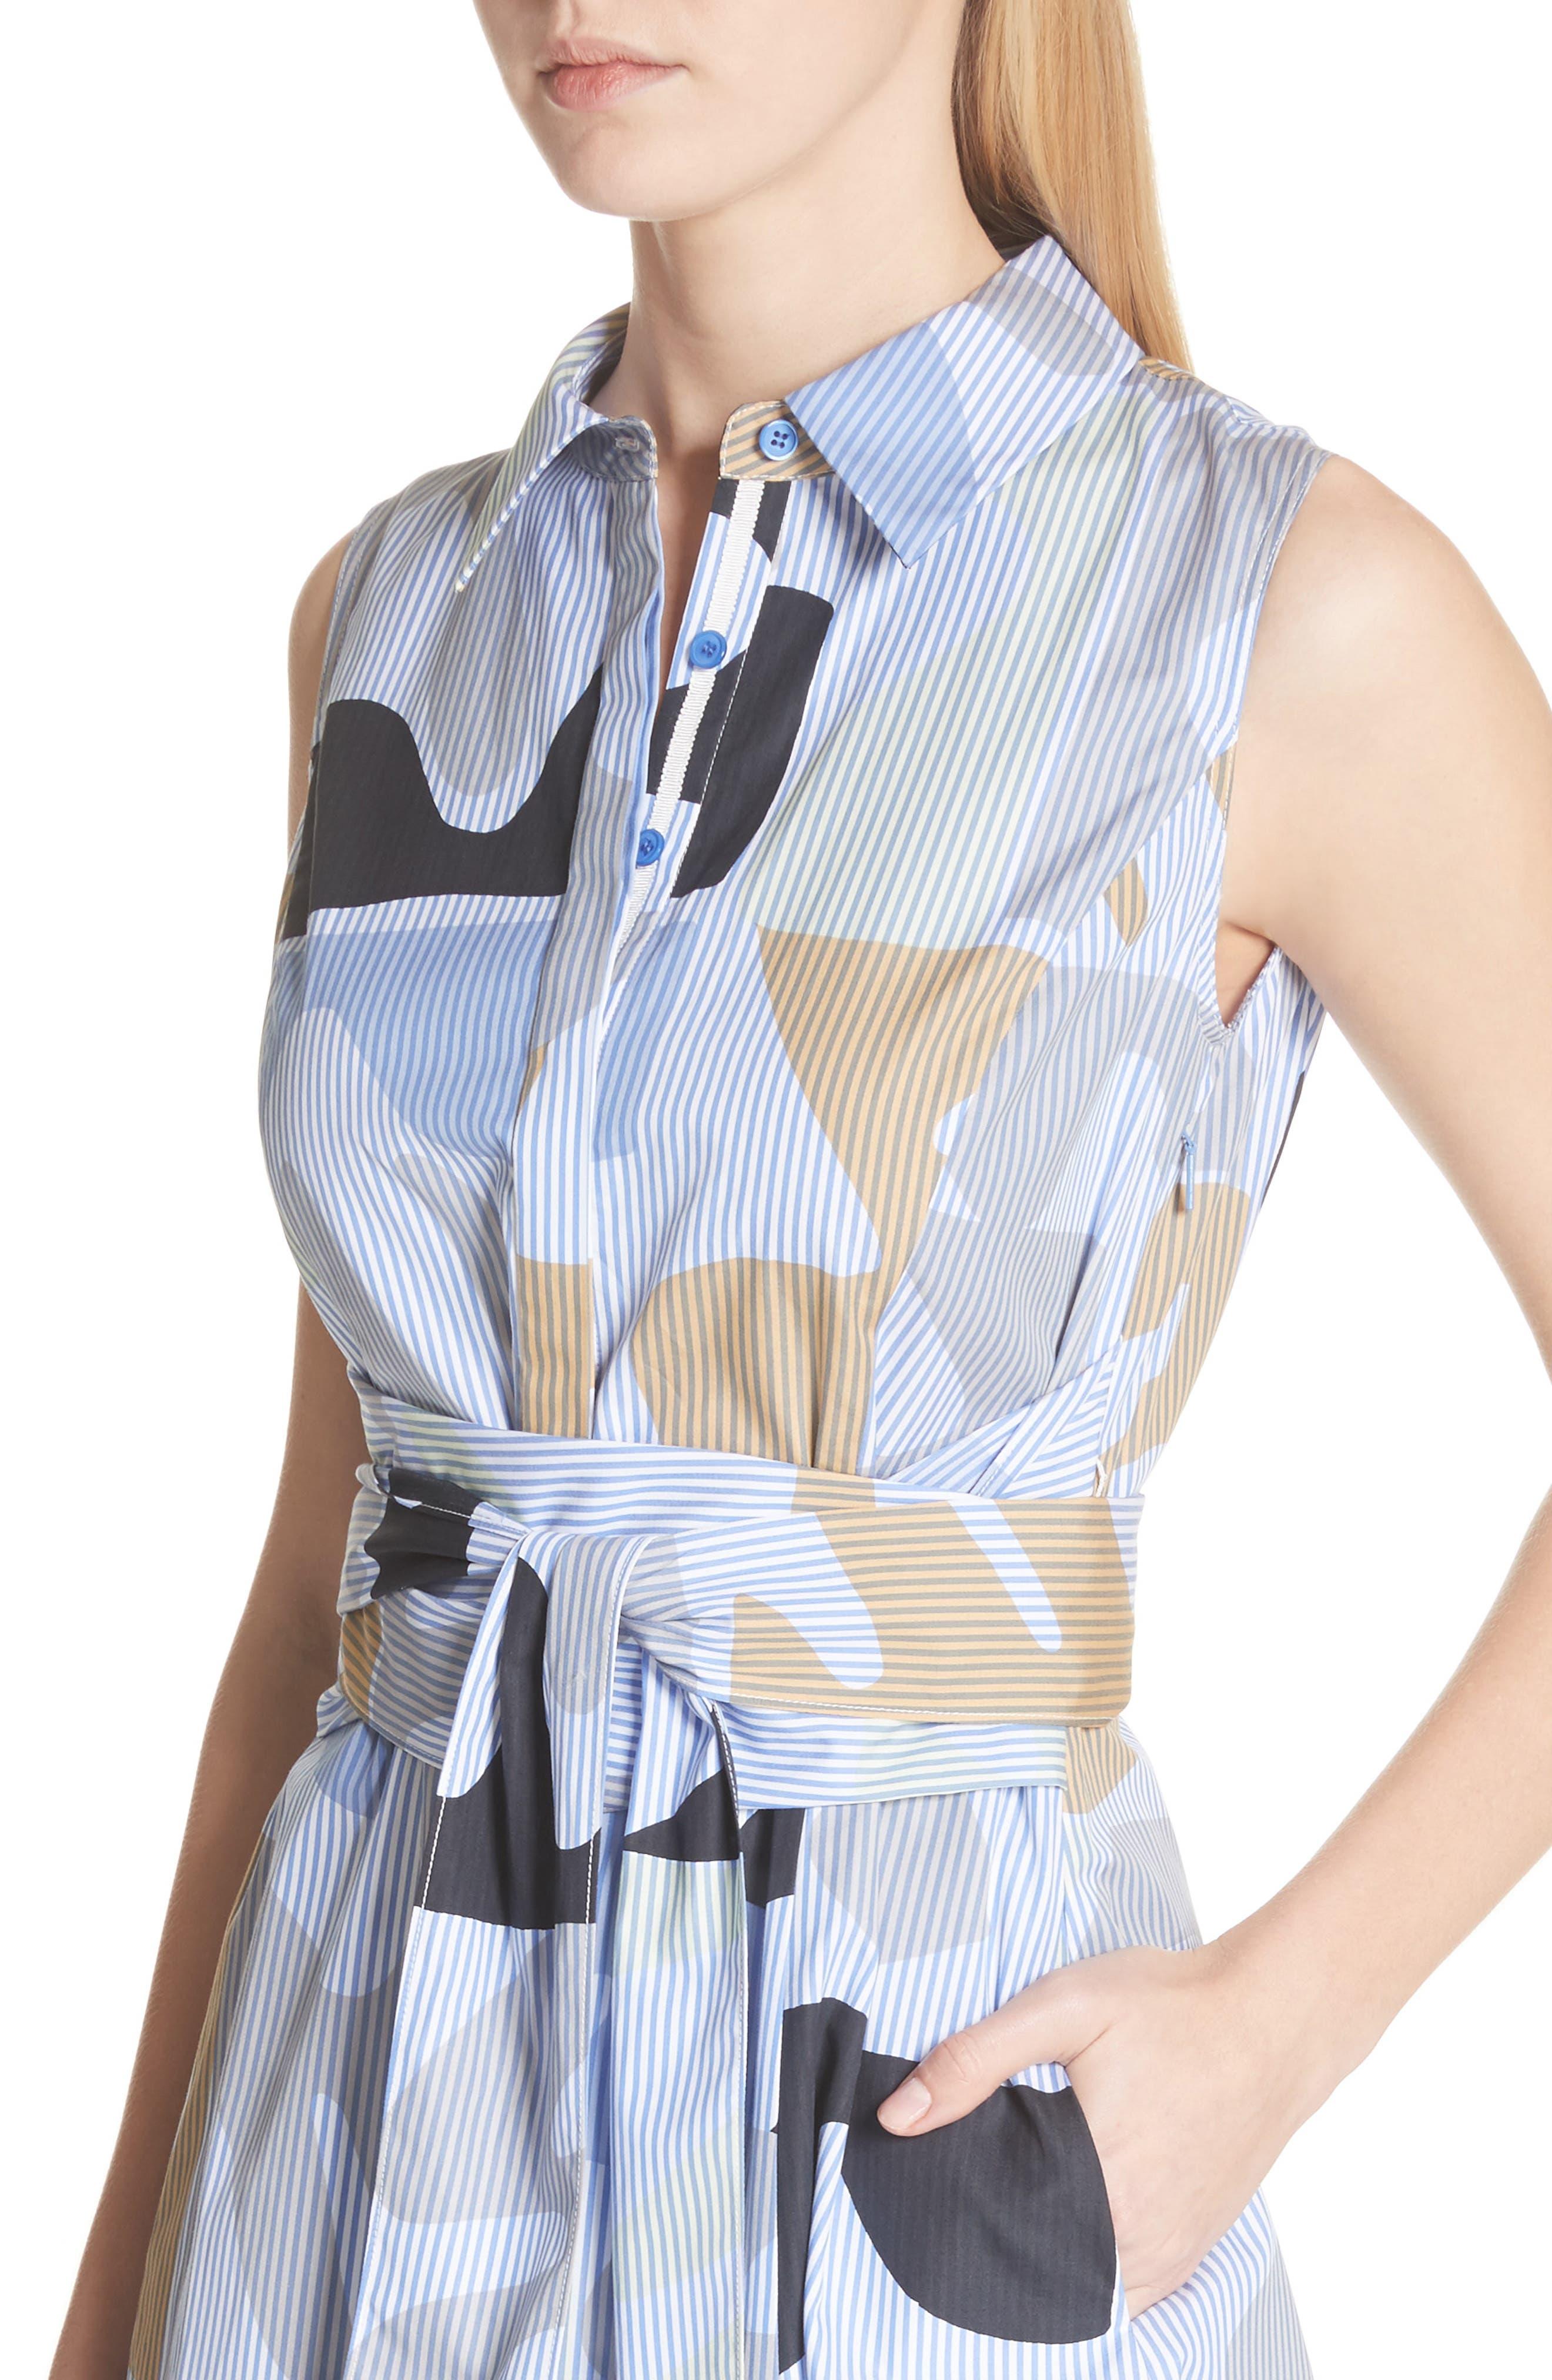 Cordelia Urban Ethos Stripe Dress,                             Alternate thumbnail 4, color,                             Periwinkle Multi